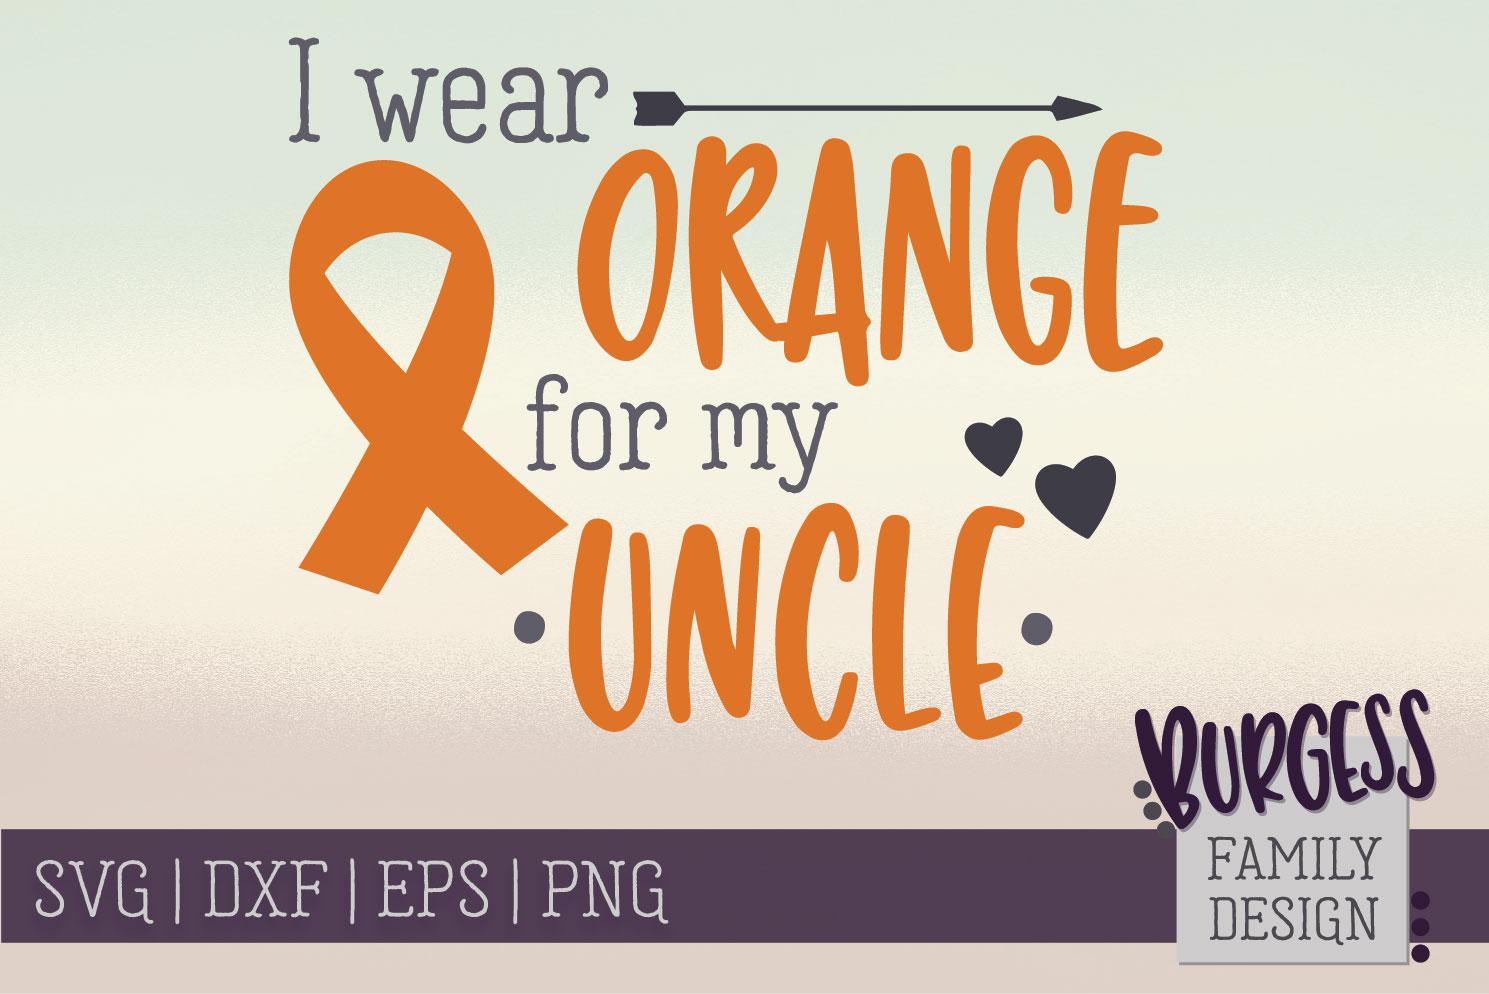 BUNDLE | I wear orange for my family | SVG DXF EPS PN example image 2